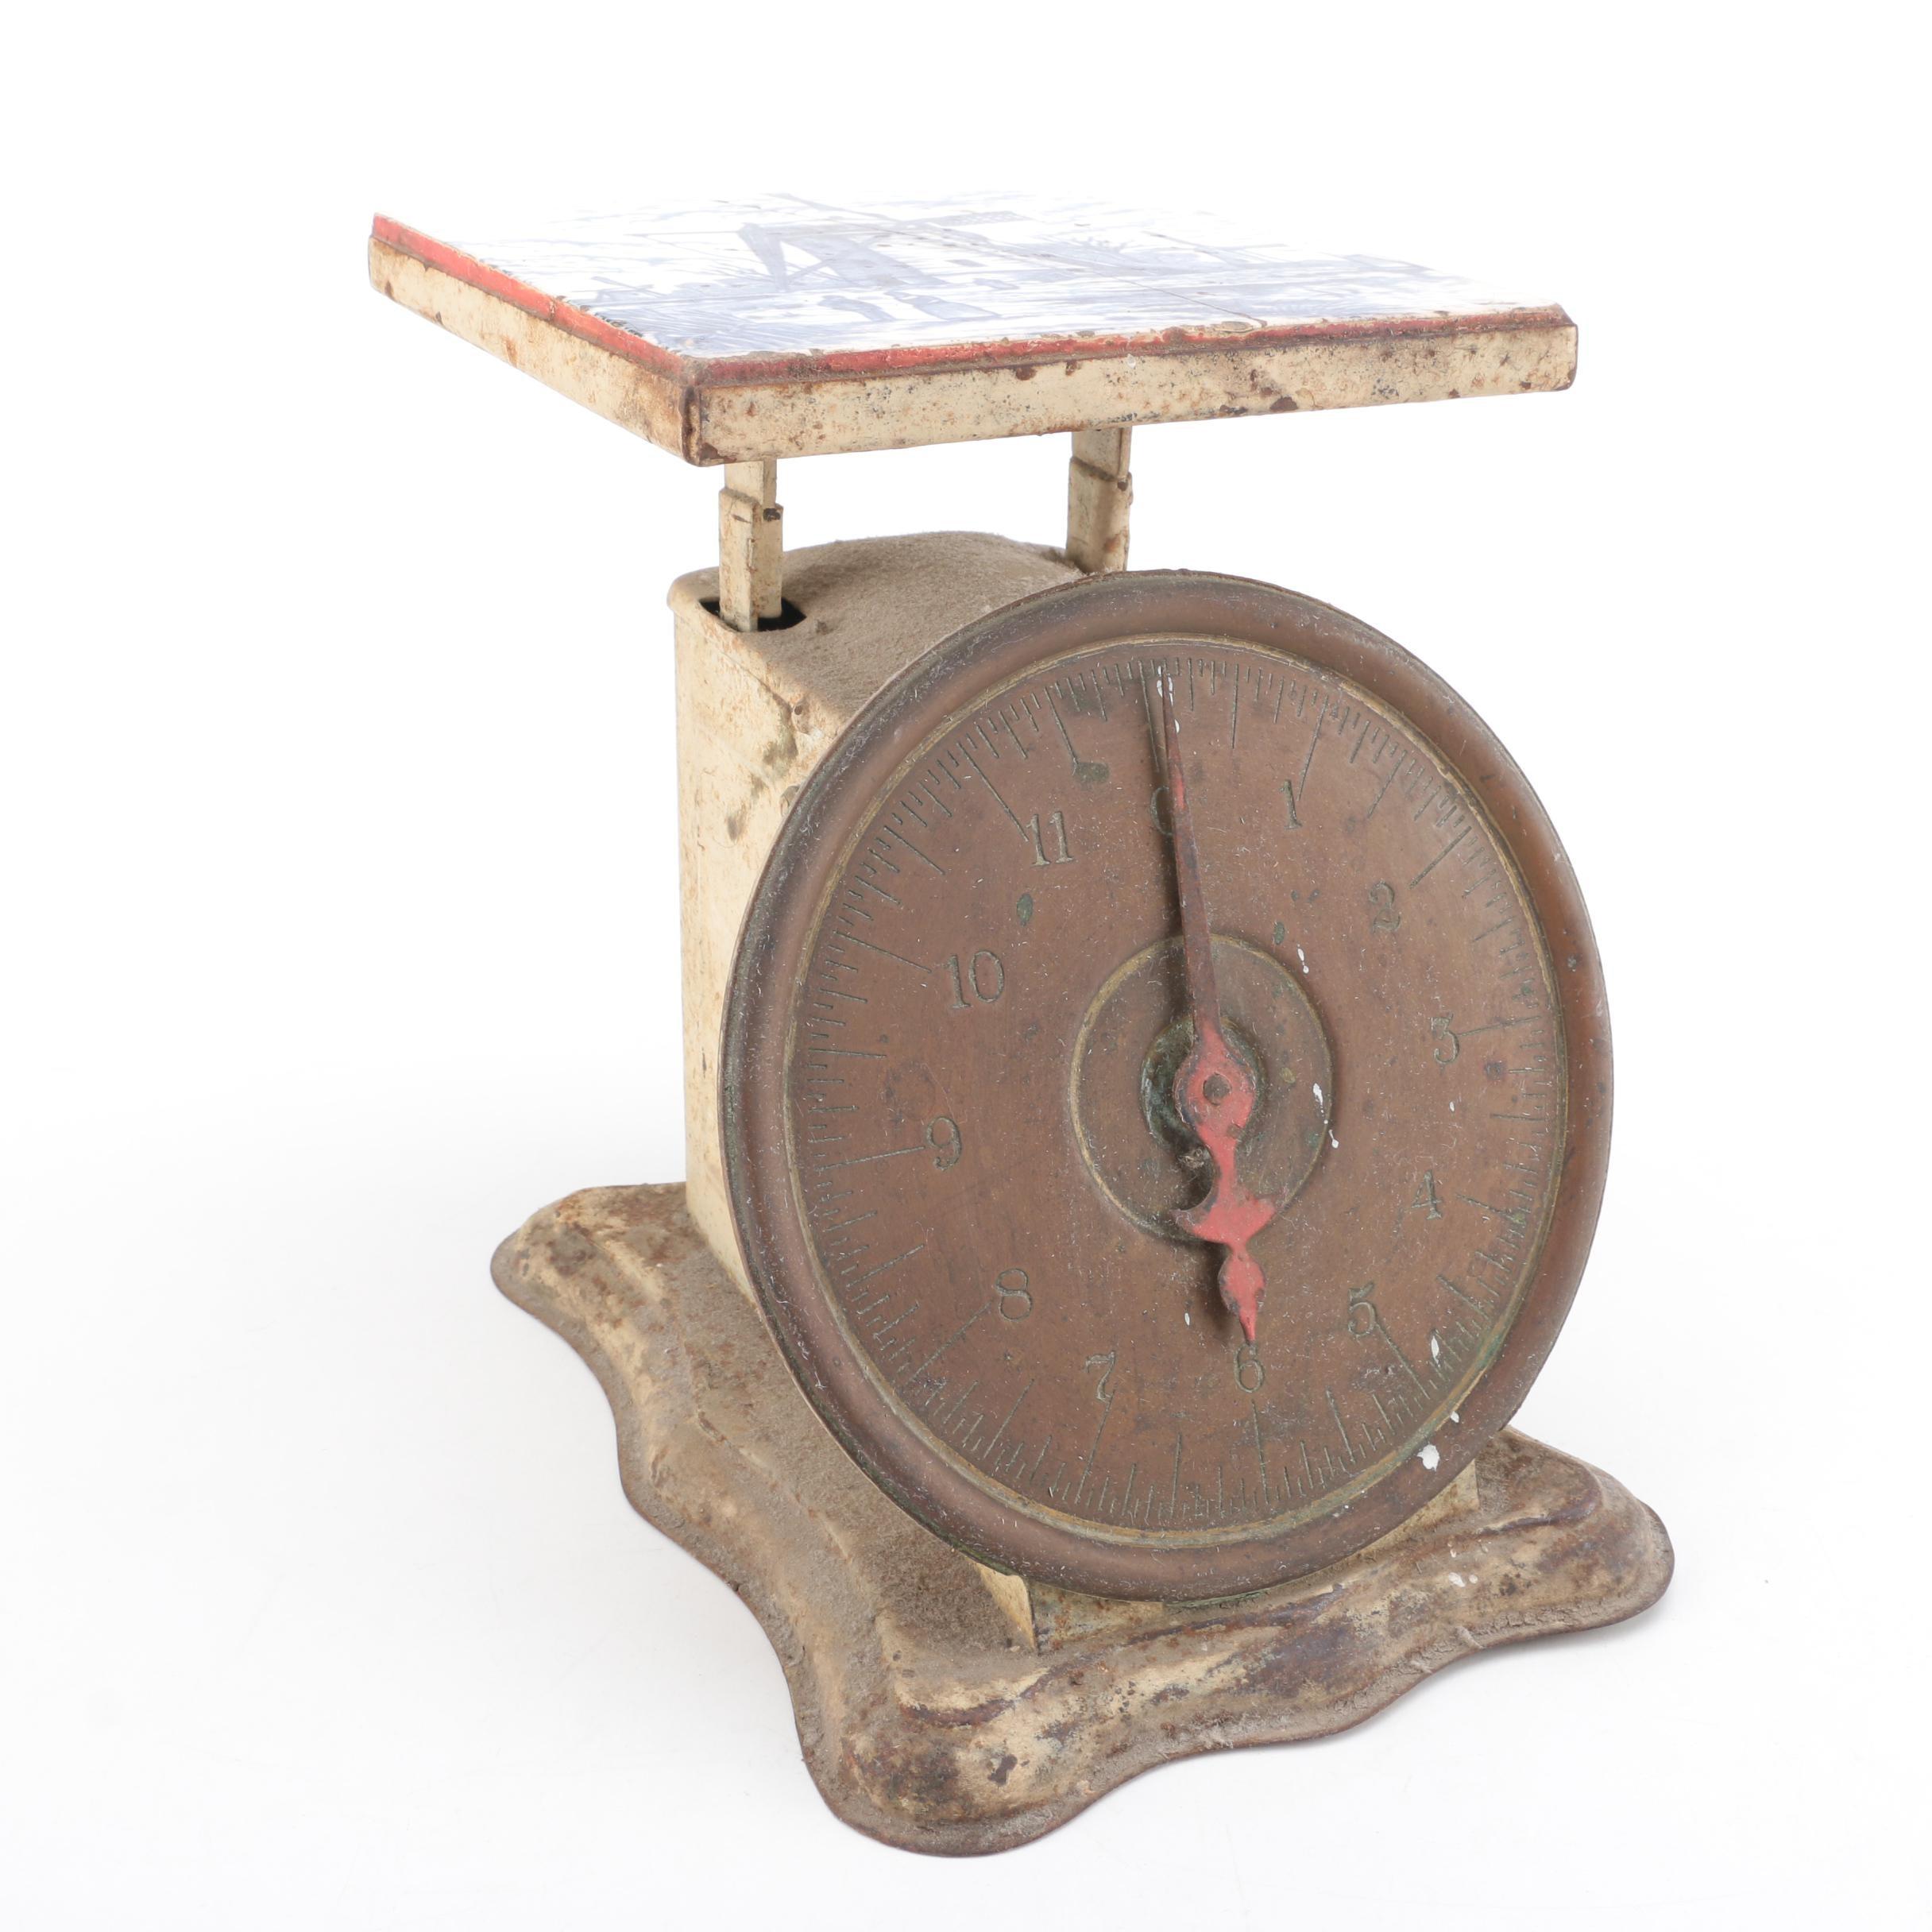 Antique Kitchen Scale With Delft Tile Top